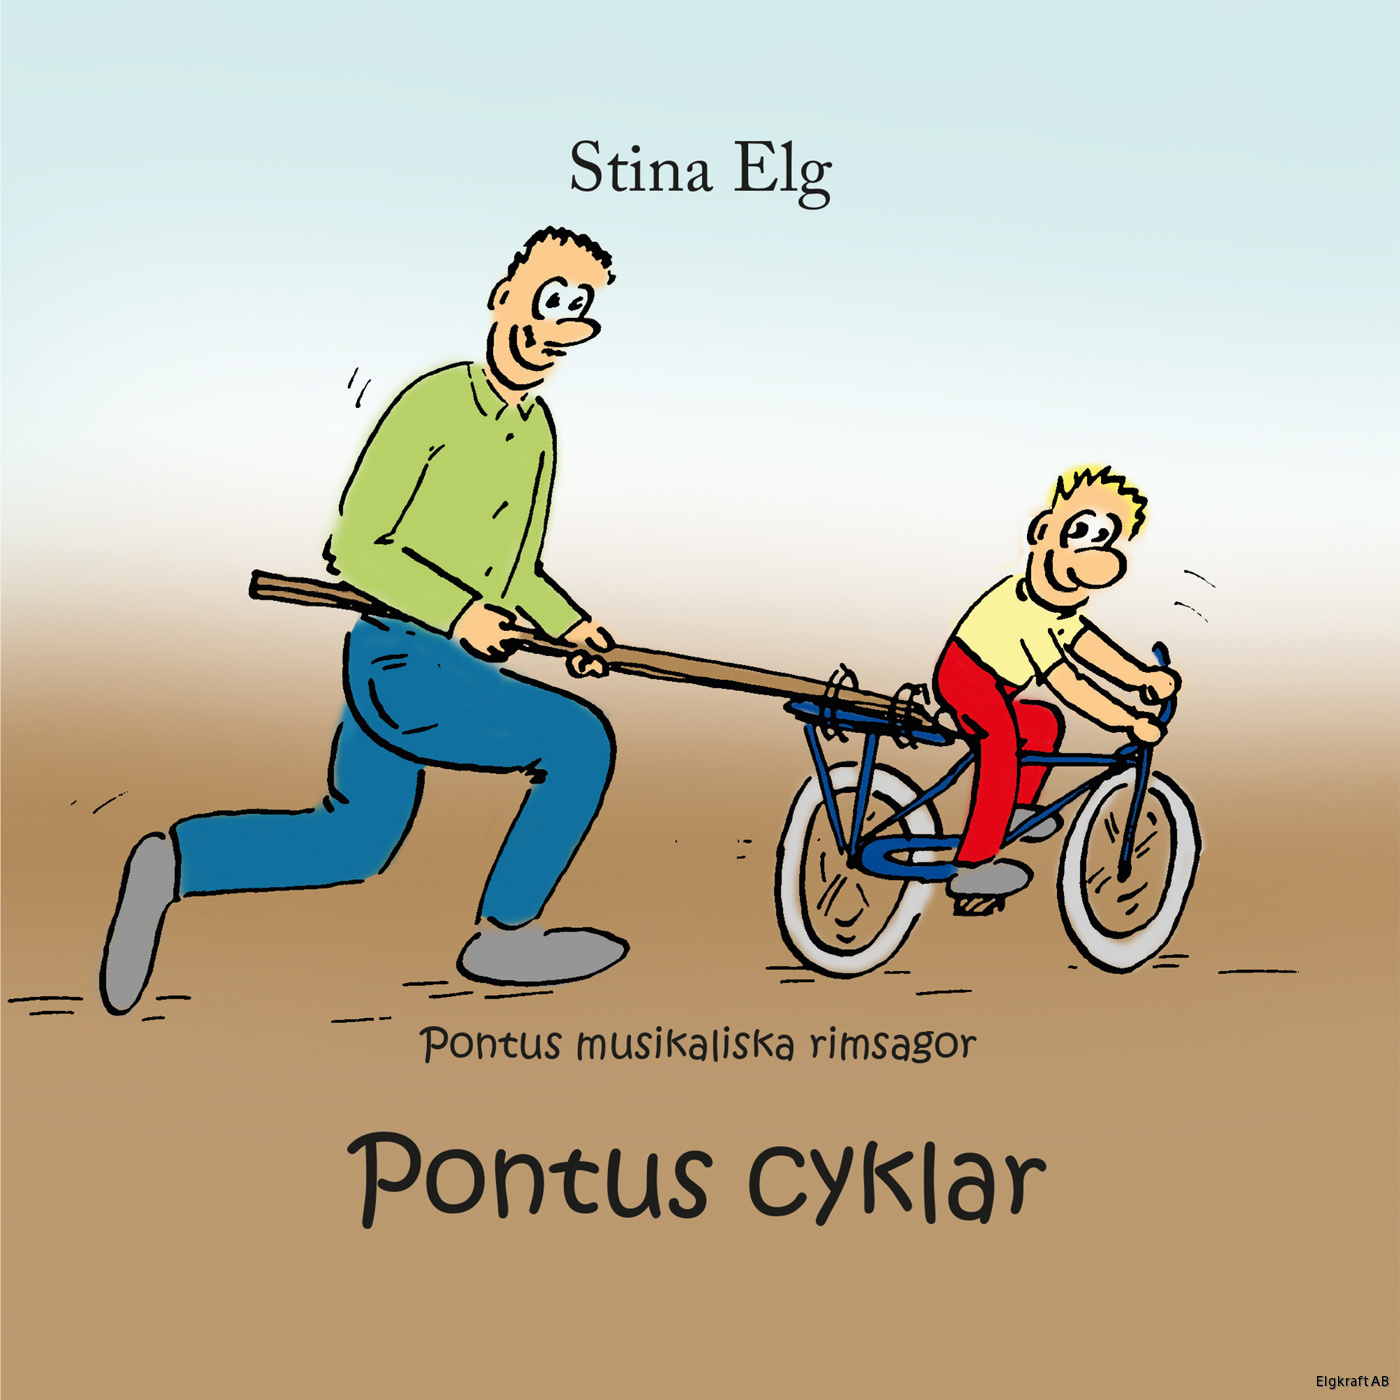 Pontus cyklar